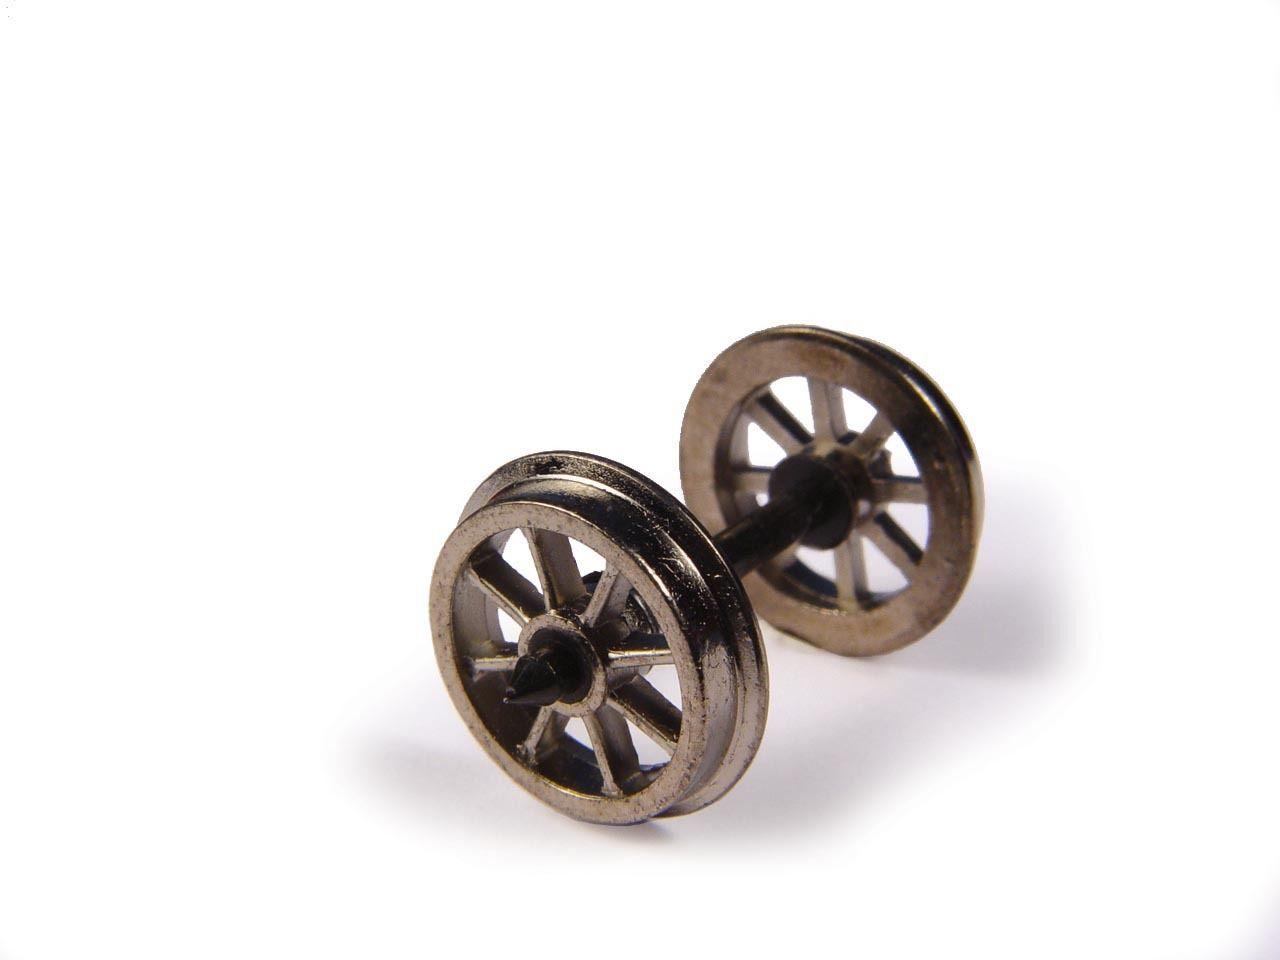 Bachmann 36-014 -10 x (Axles) 12mm dia  Metal Spoked Wagon Wheels Tracked48  Post